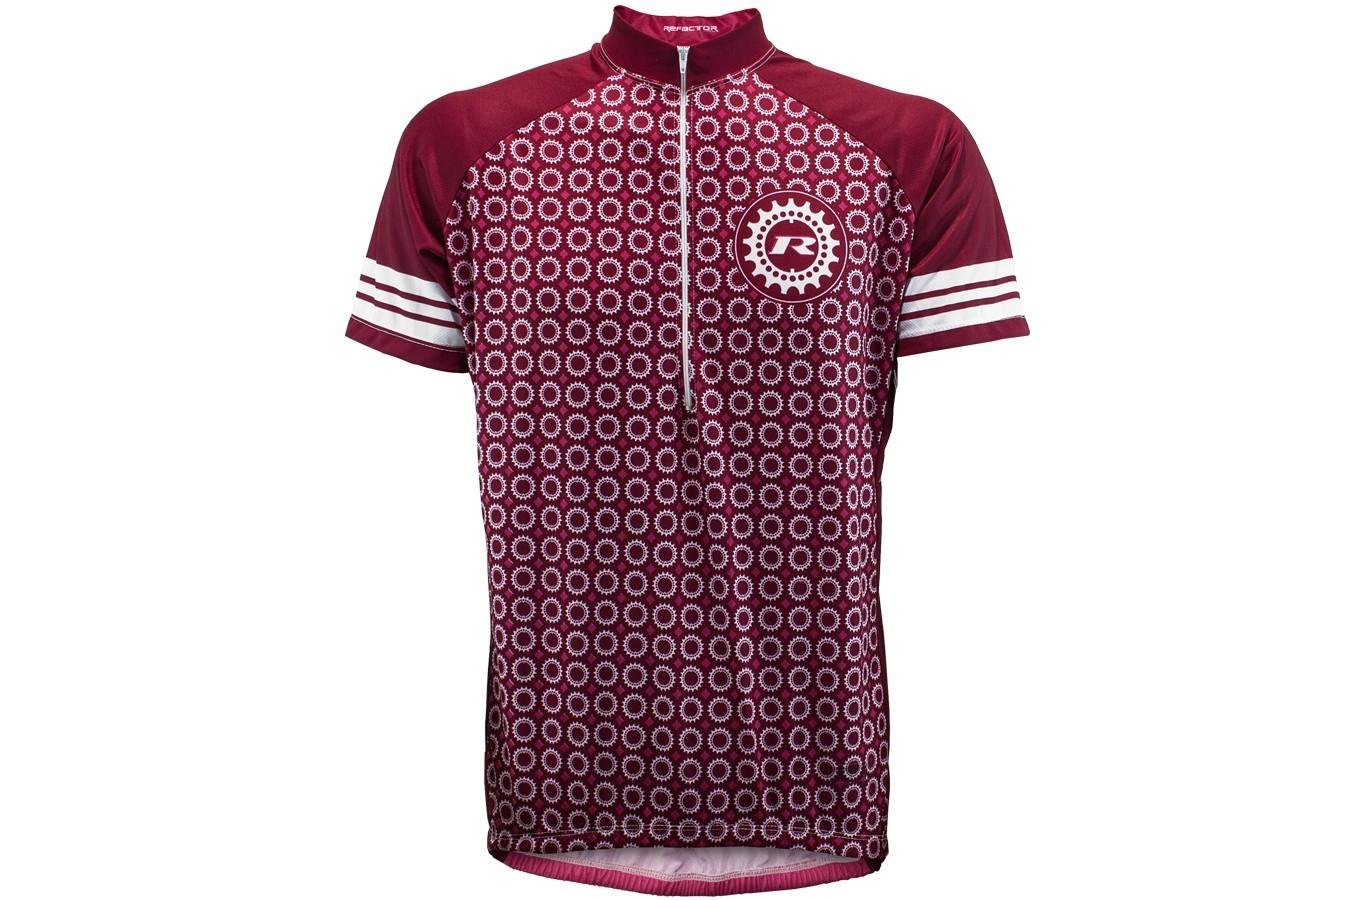 Camisa Ciclista Feminina Catraca - Refactor